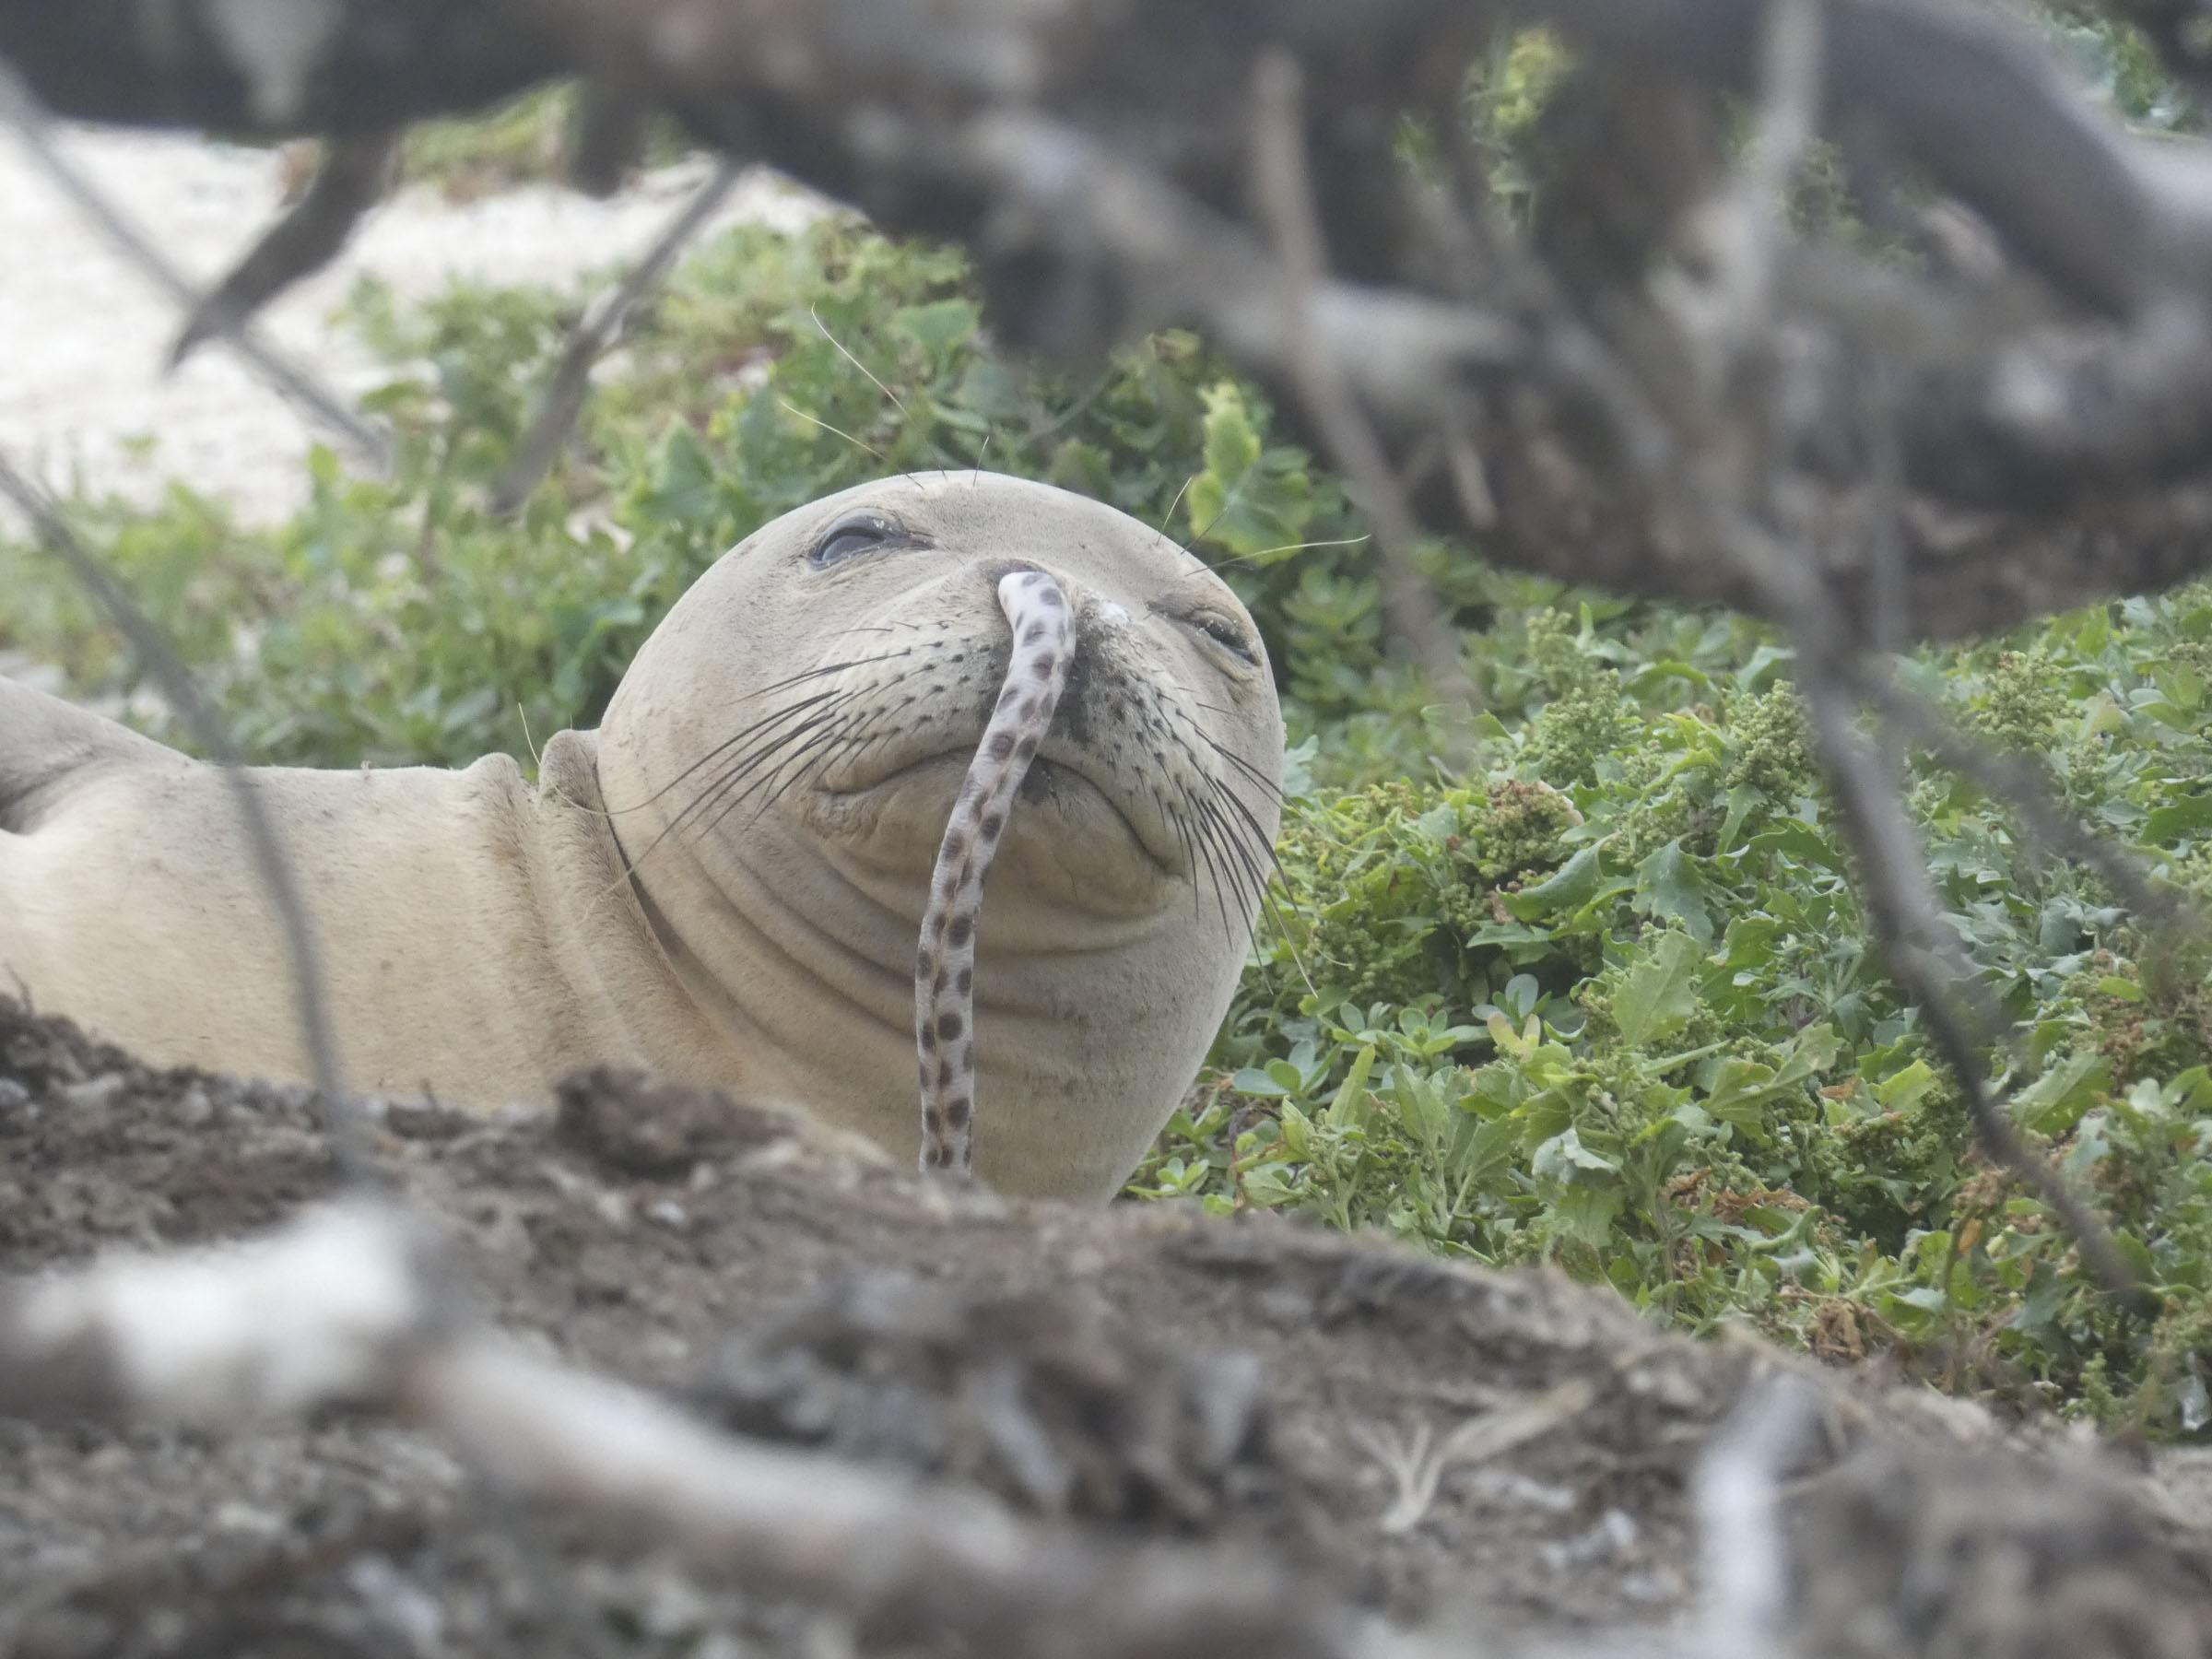 http://mystylenews.com/wp-content/uploads/2018/12/ccelebritiesfoto4896x3672-hawaiianmonkseal-eel-brittanydolan.jpg